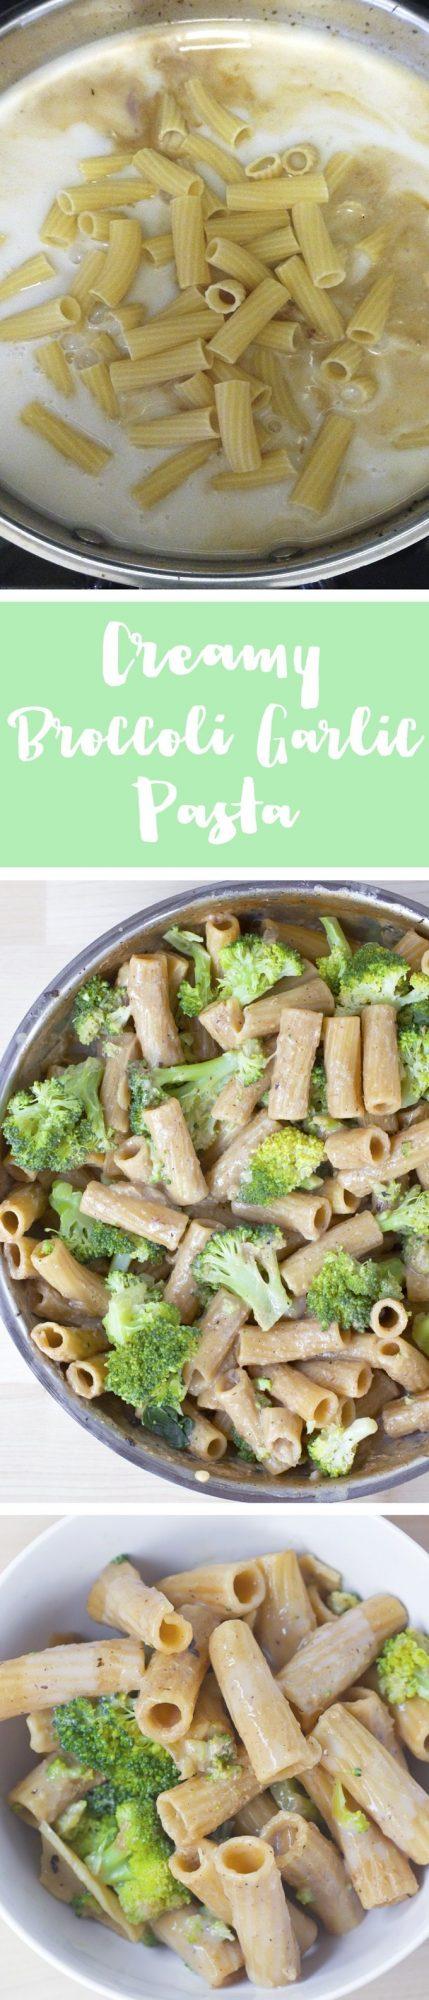 Garlic Pasta - Ingredients: 3 cups broccoli, 2 tbsp minced garlic, 2 1/2 tsp... Full recipe: http://chocolatecoveredkatie.com/2016/08/15/garlic-pasta-broccoli-vegan/ @choccoveredkt